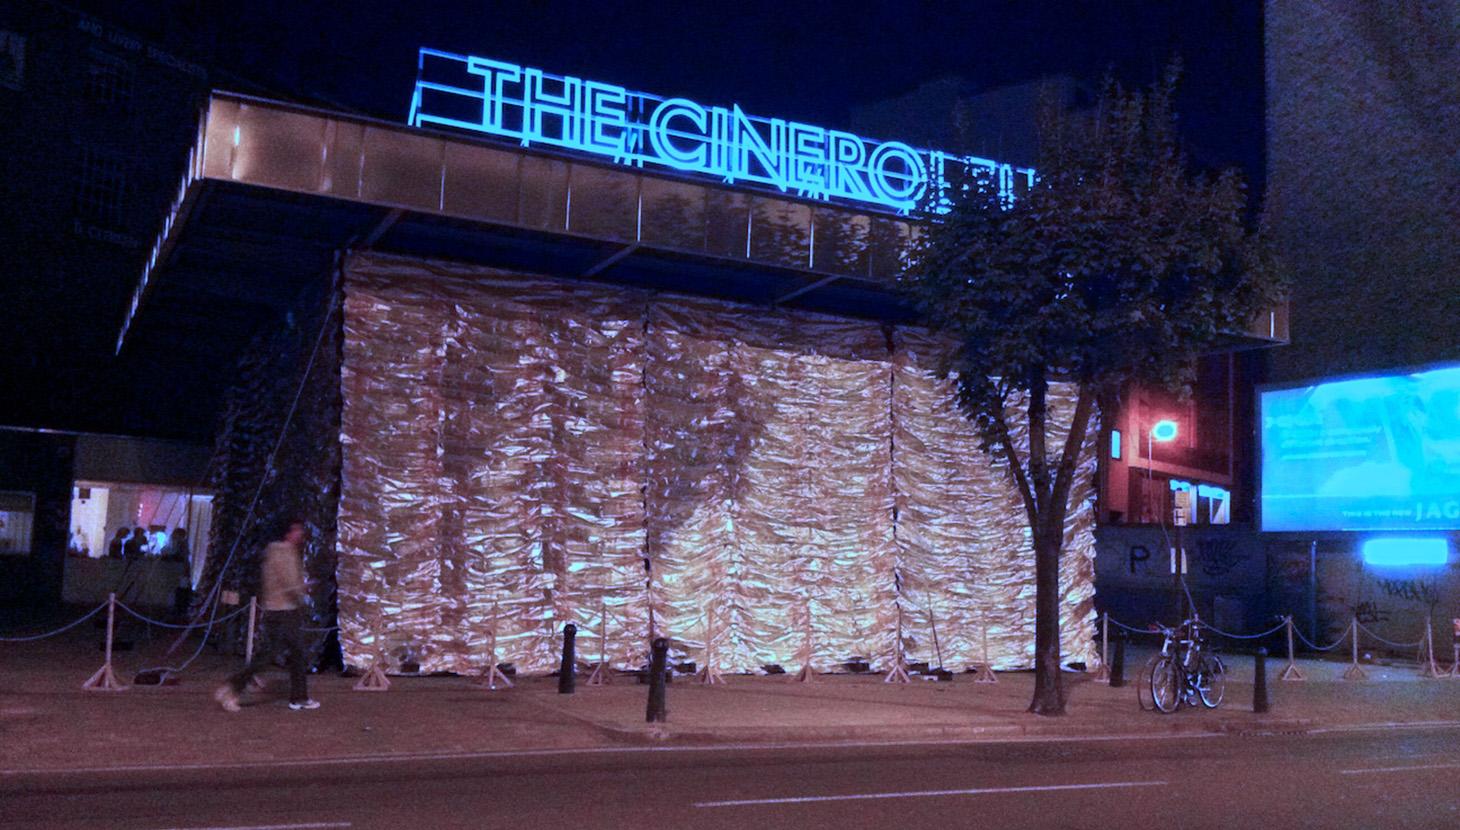 Cineroleum at night, Clerkenwell Road, London ph. John Gorgy